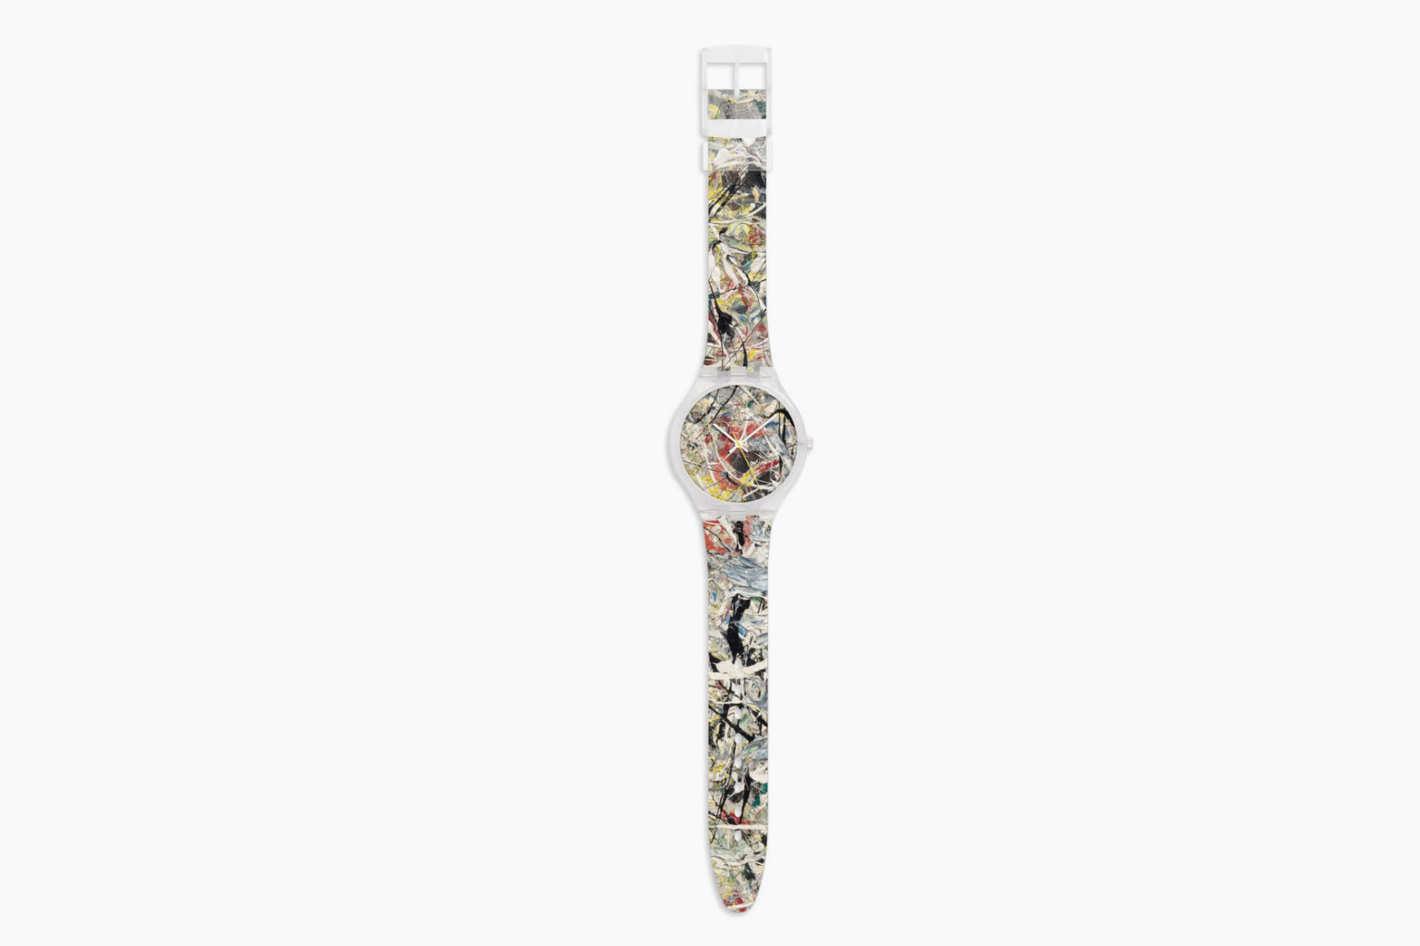 Pollock White Light Watch